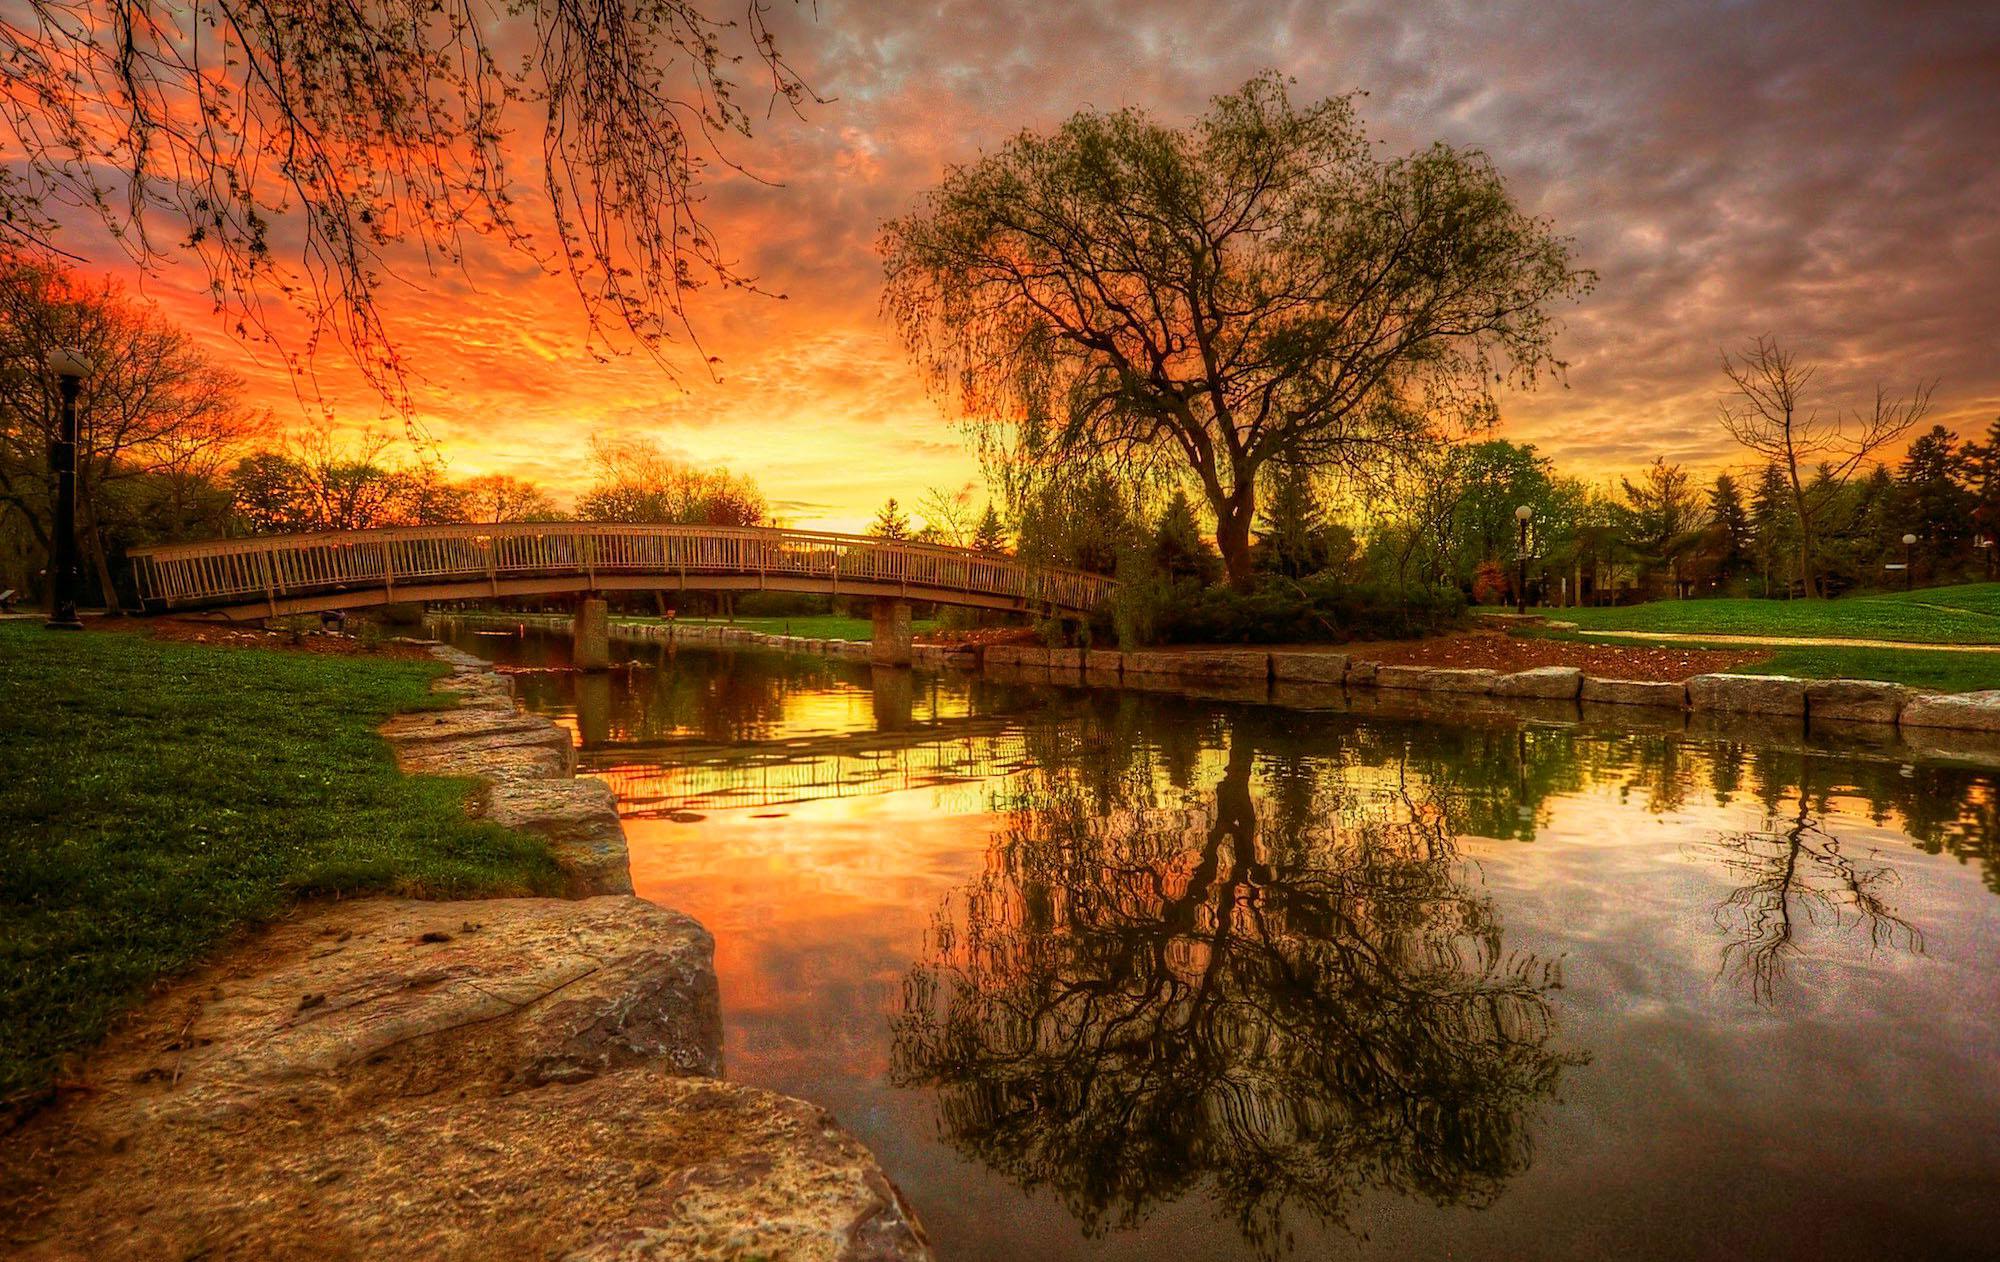 Download Landscape Wallpapers For Desktop Gallery 2000x1262